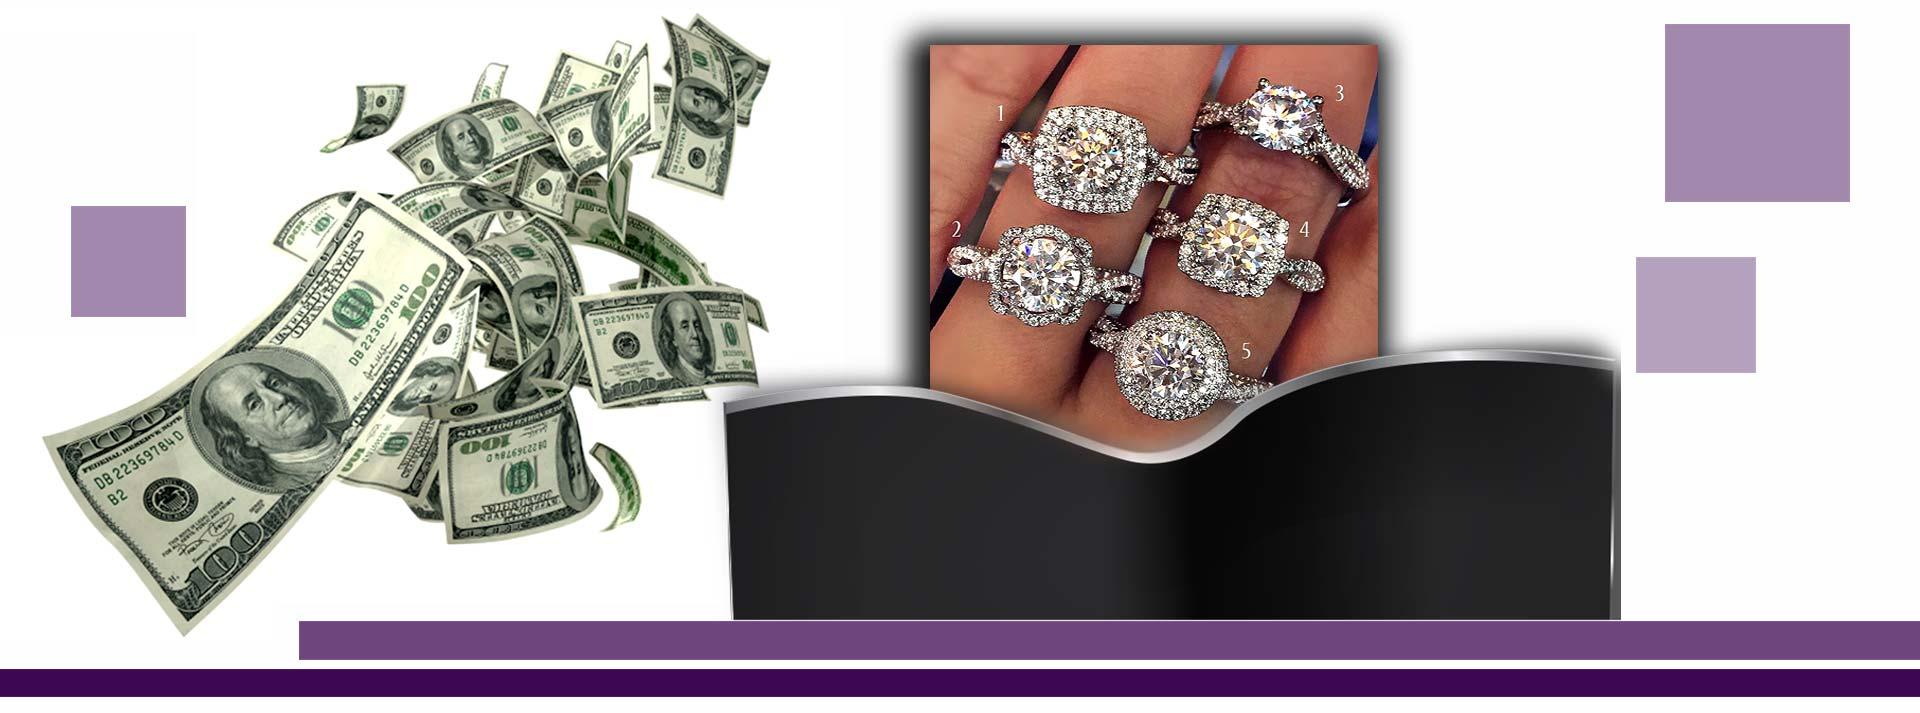 طراحی جواهرات سفارشی1